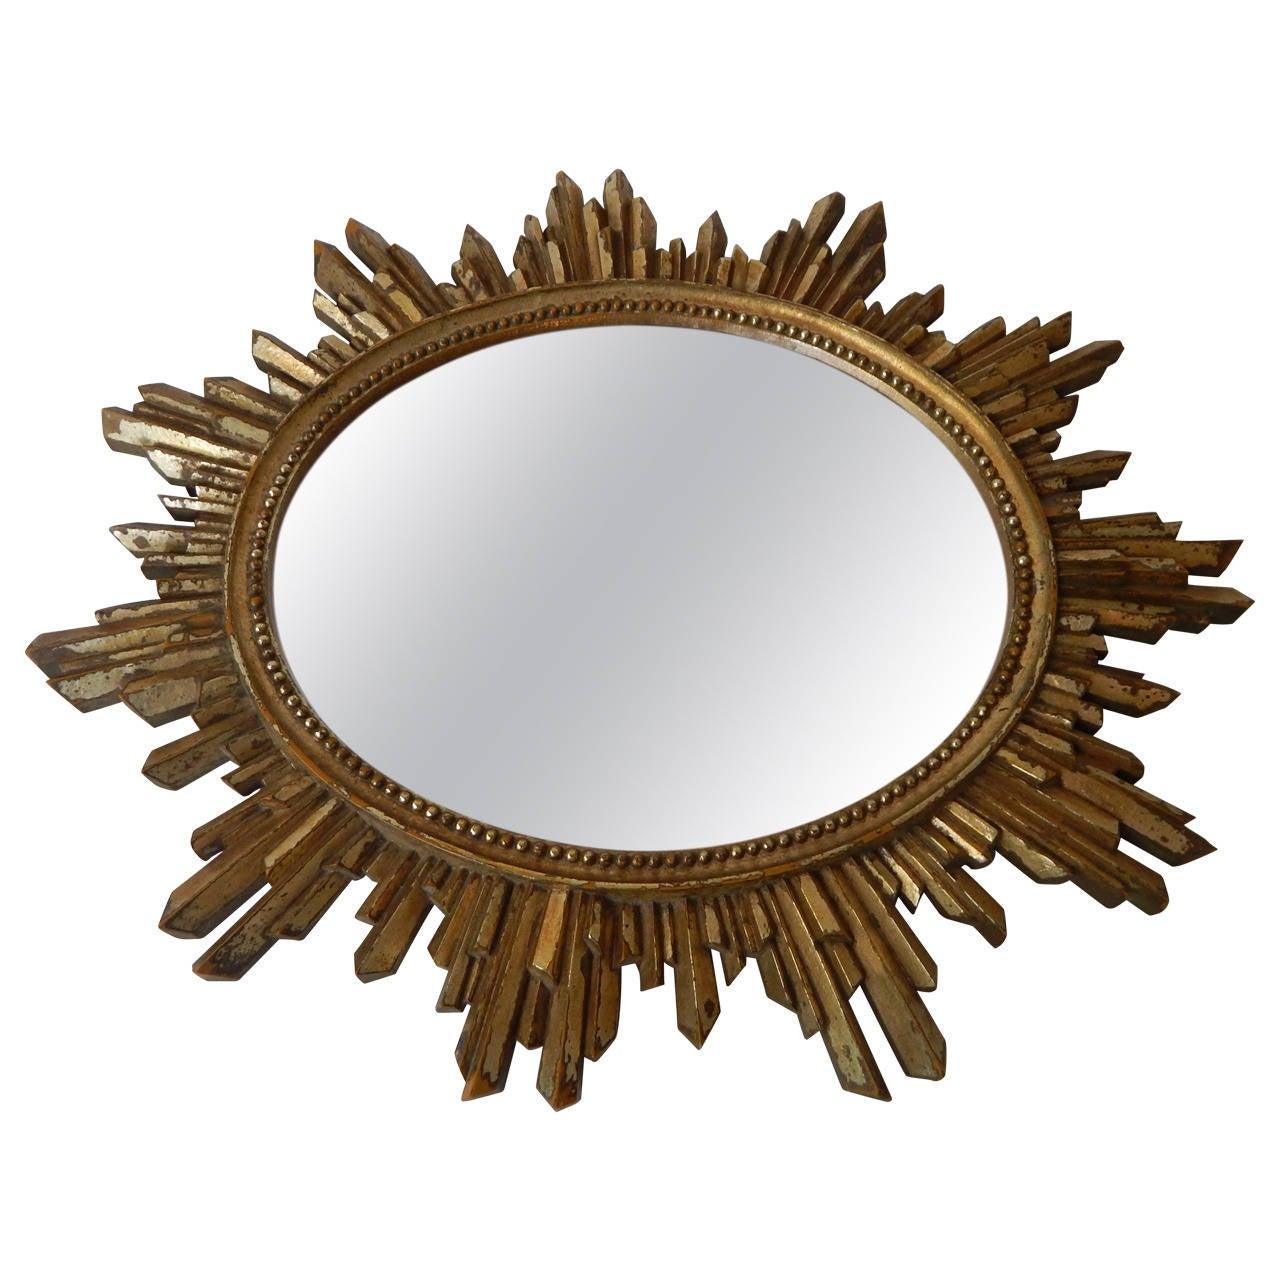 Antique italian giltwood sunburst mirror for sale at 1stdibs for Sunburst mirror